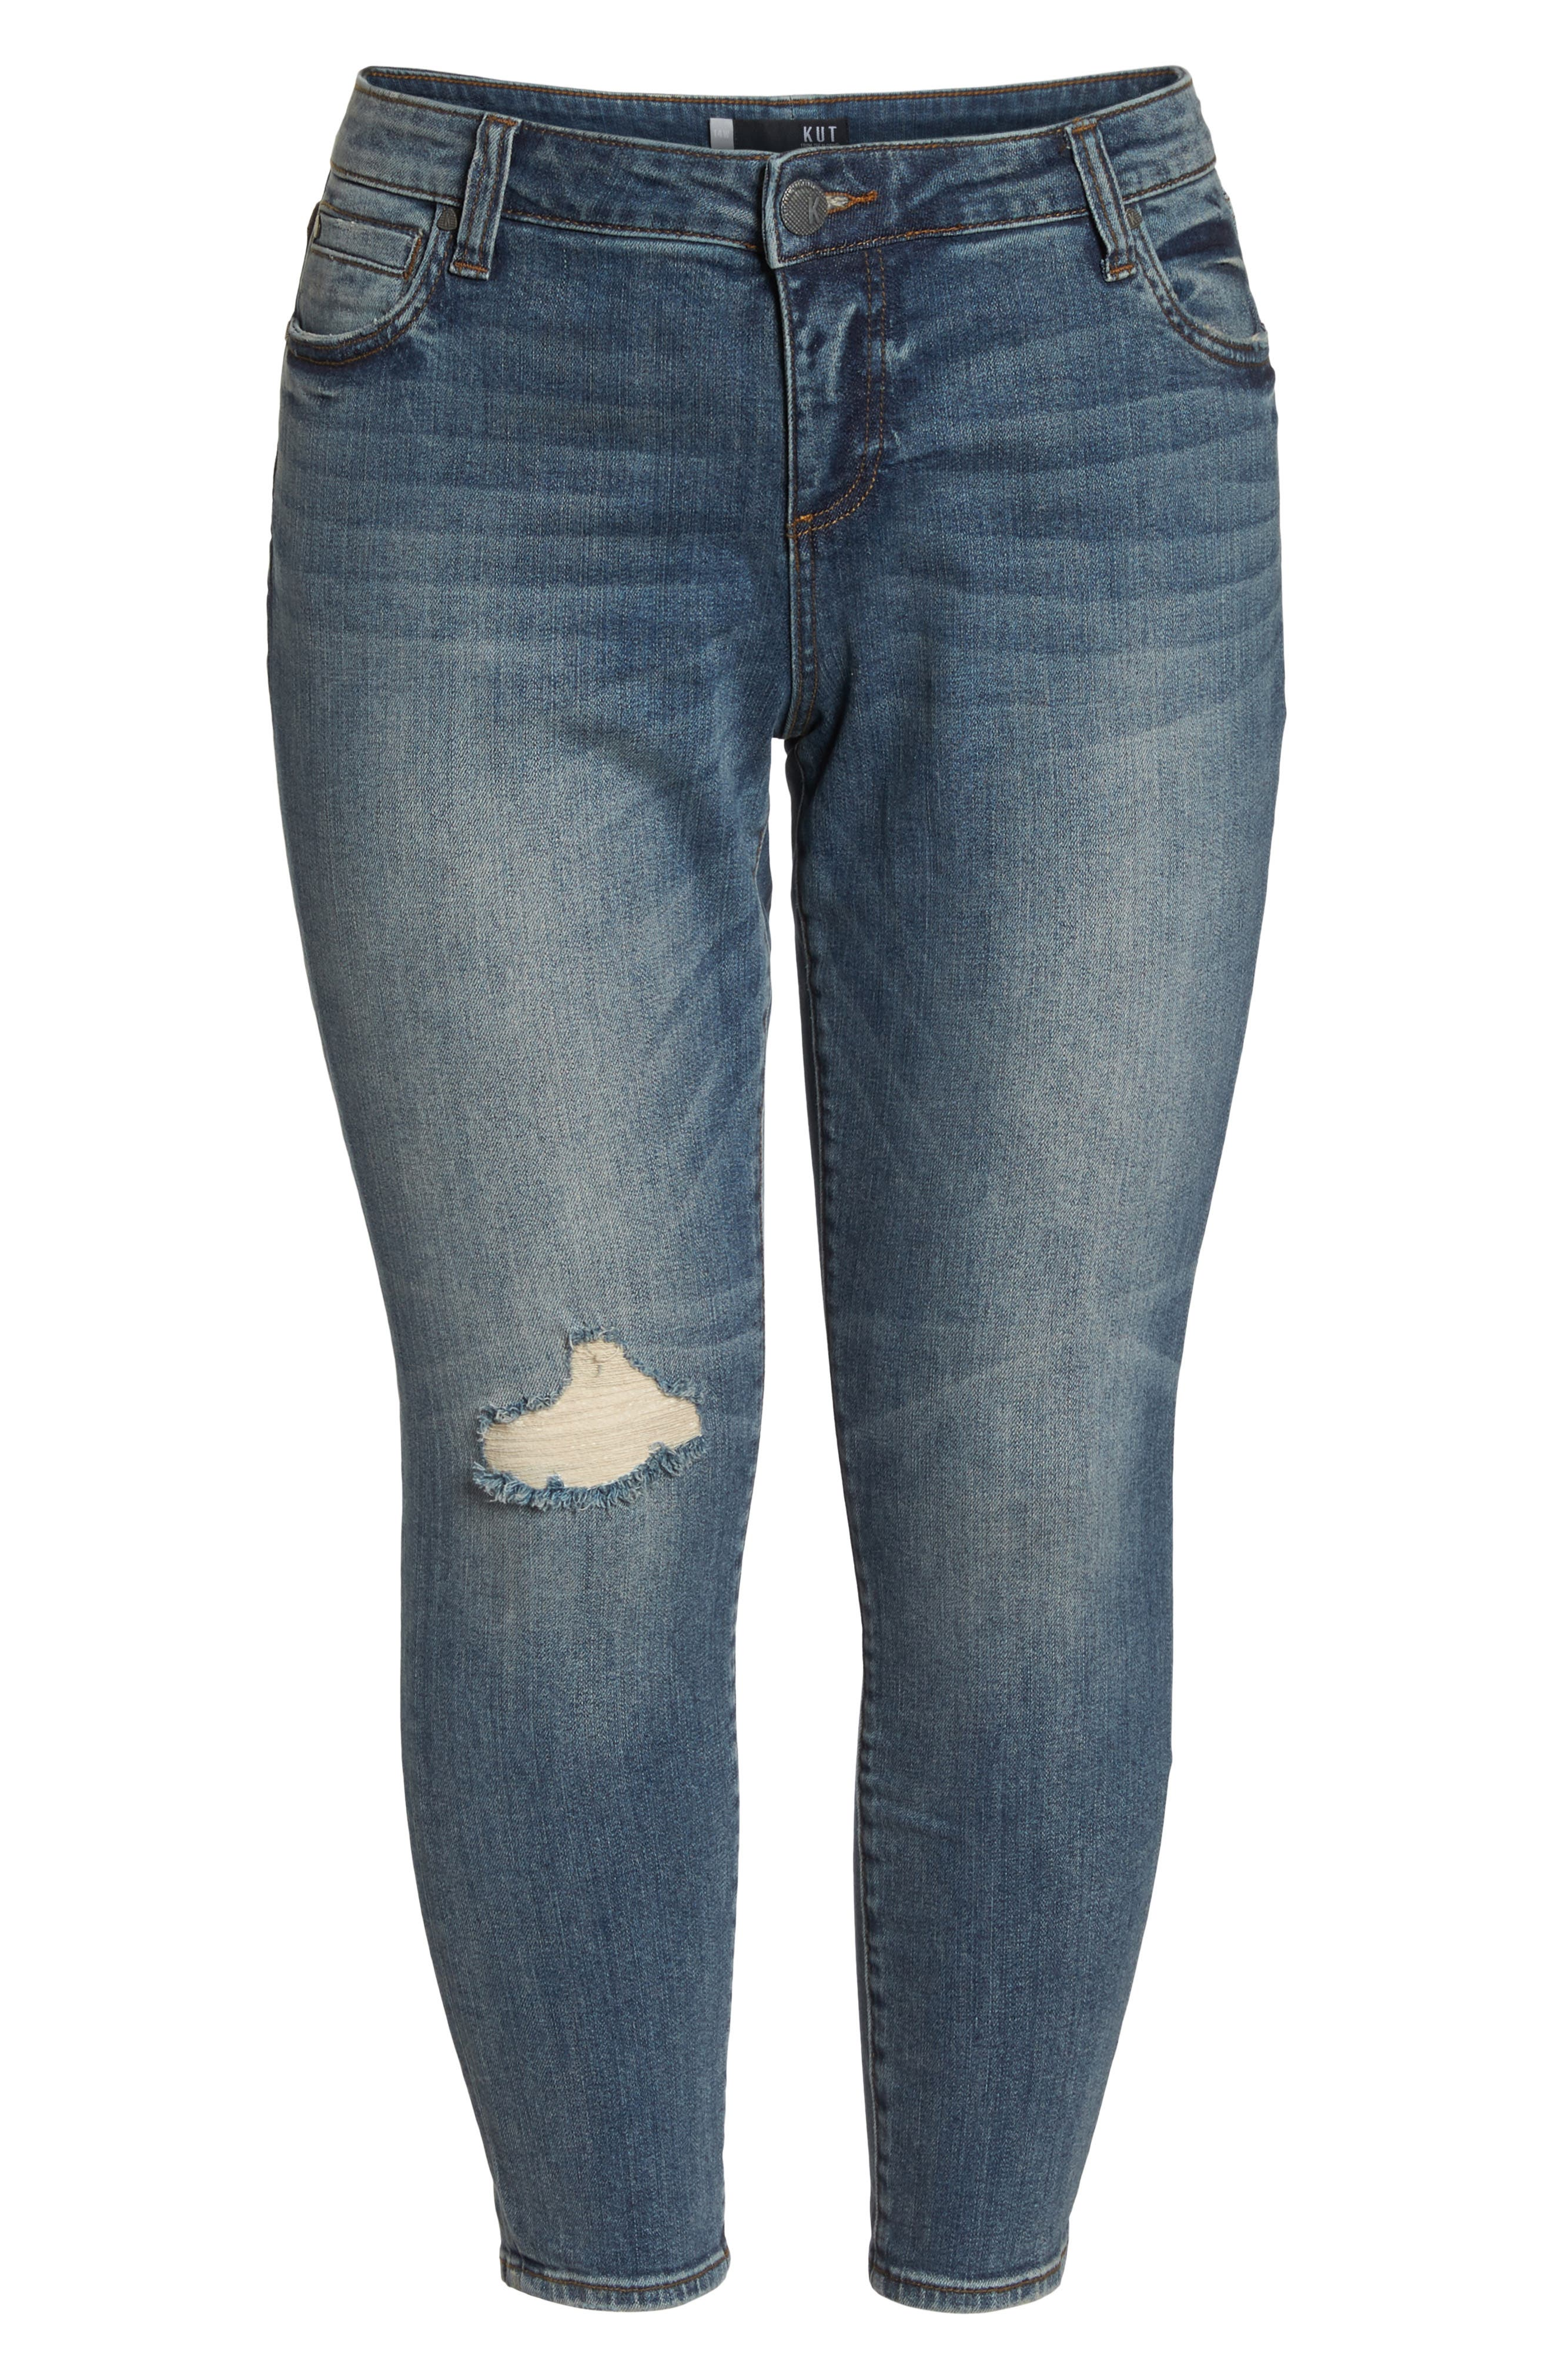 Catherine Ankle Straight Leg Jeans,                             Alternate thumbnail 7, color,                             452